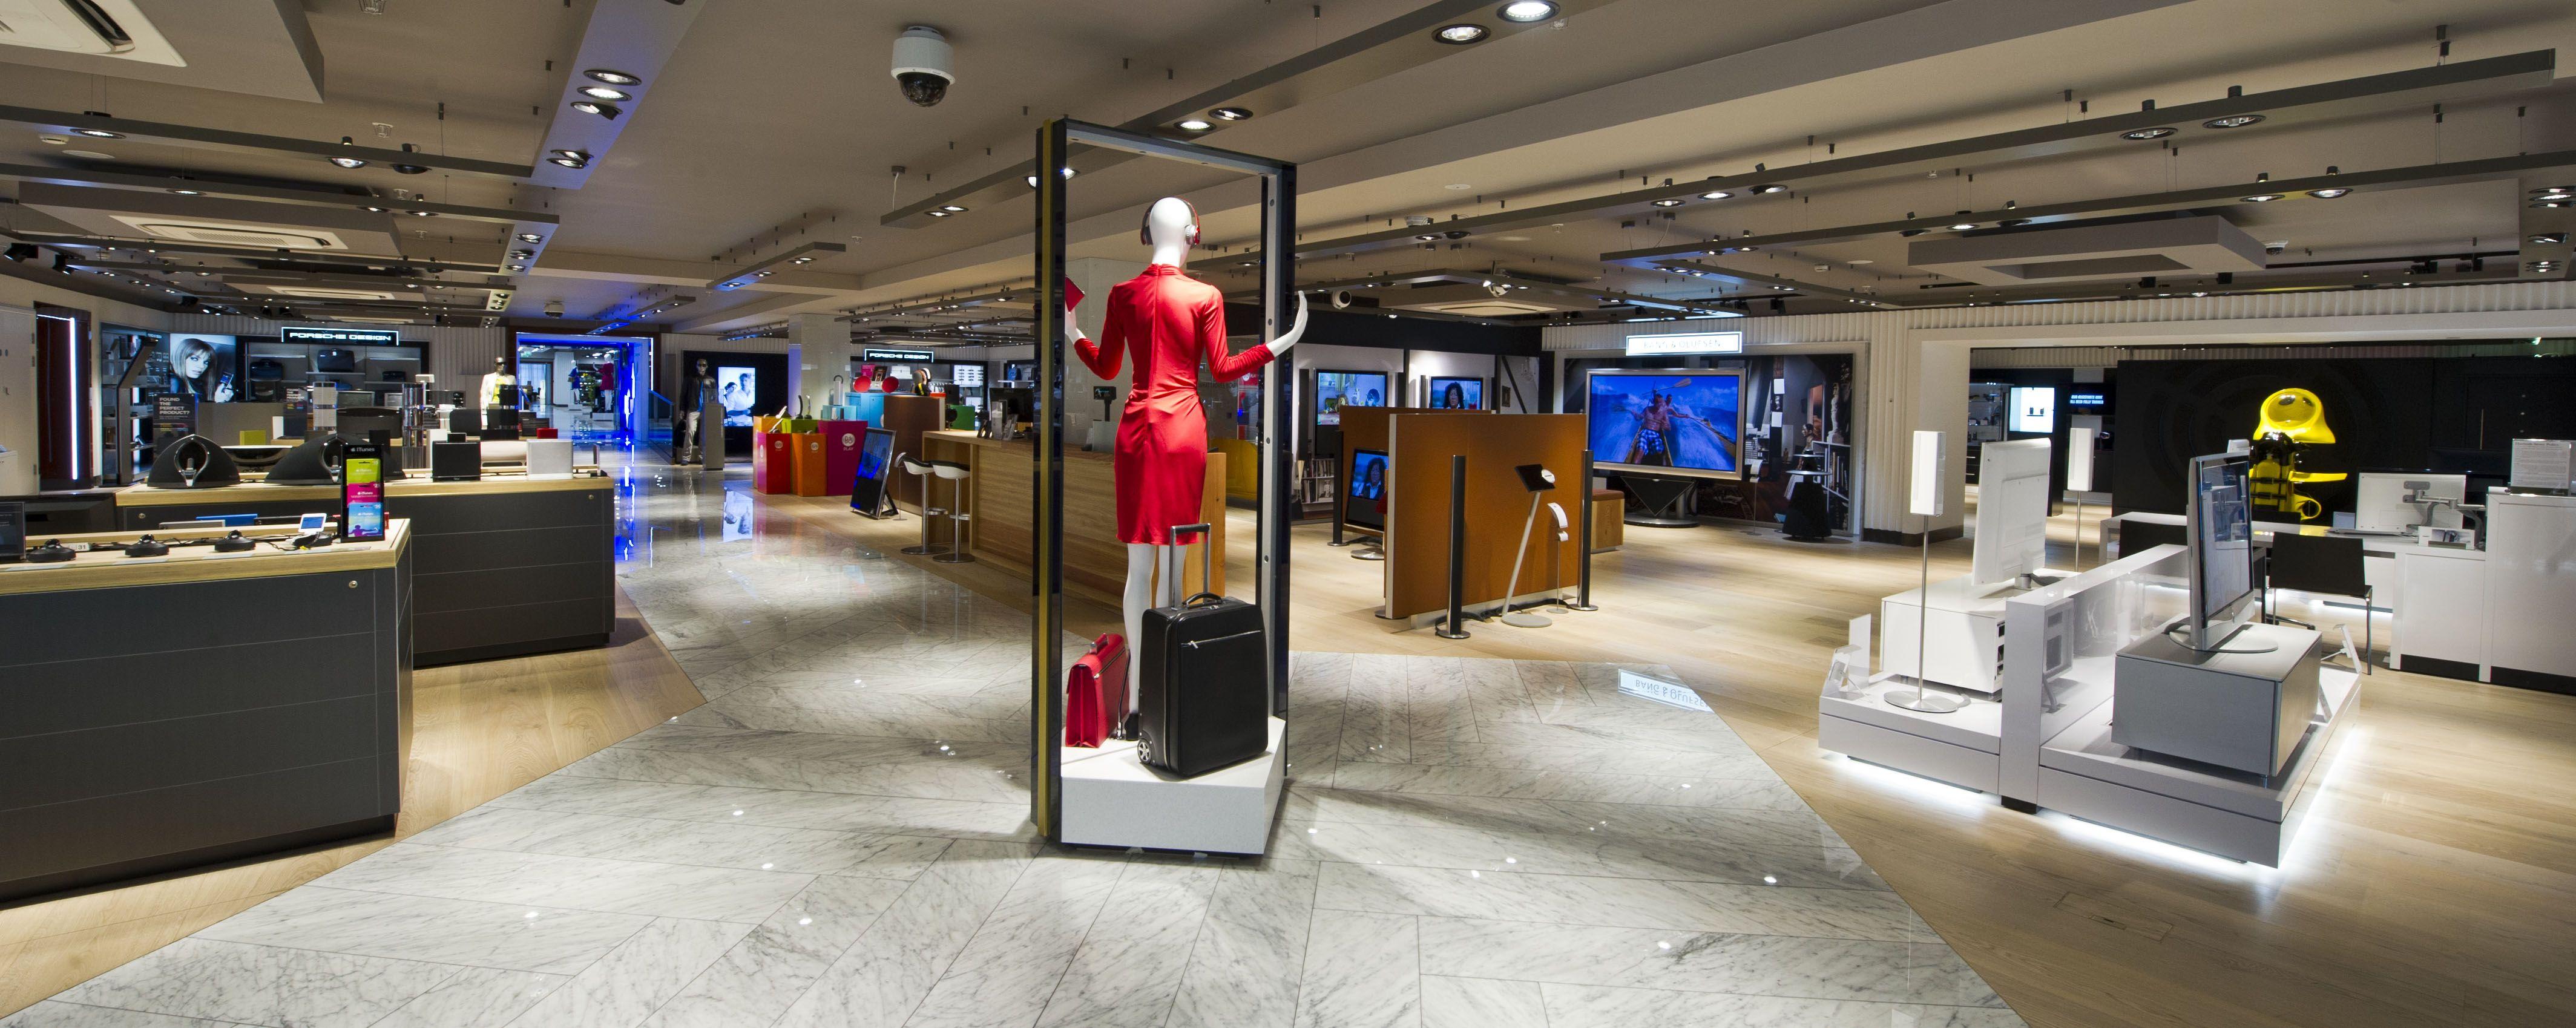 Retail Design | Shop Design | Electrical Store Interior | Harrods ...